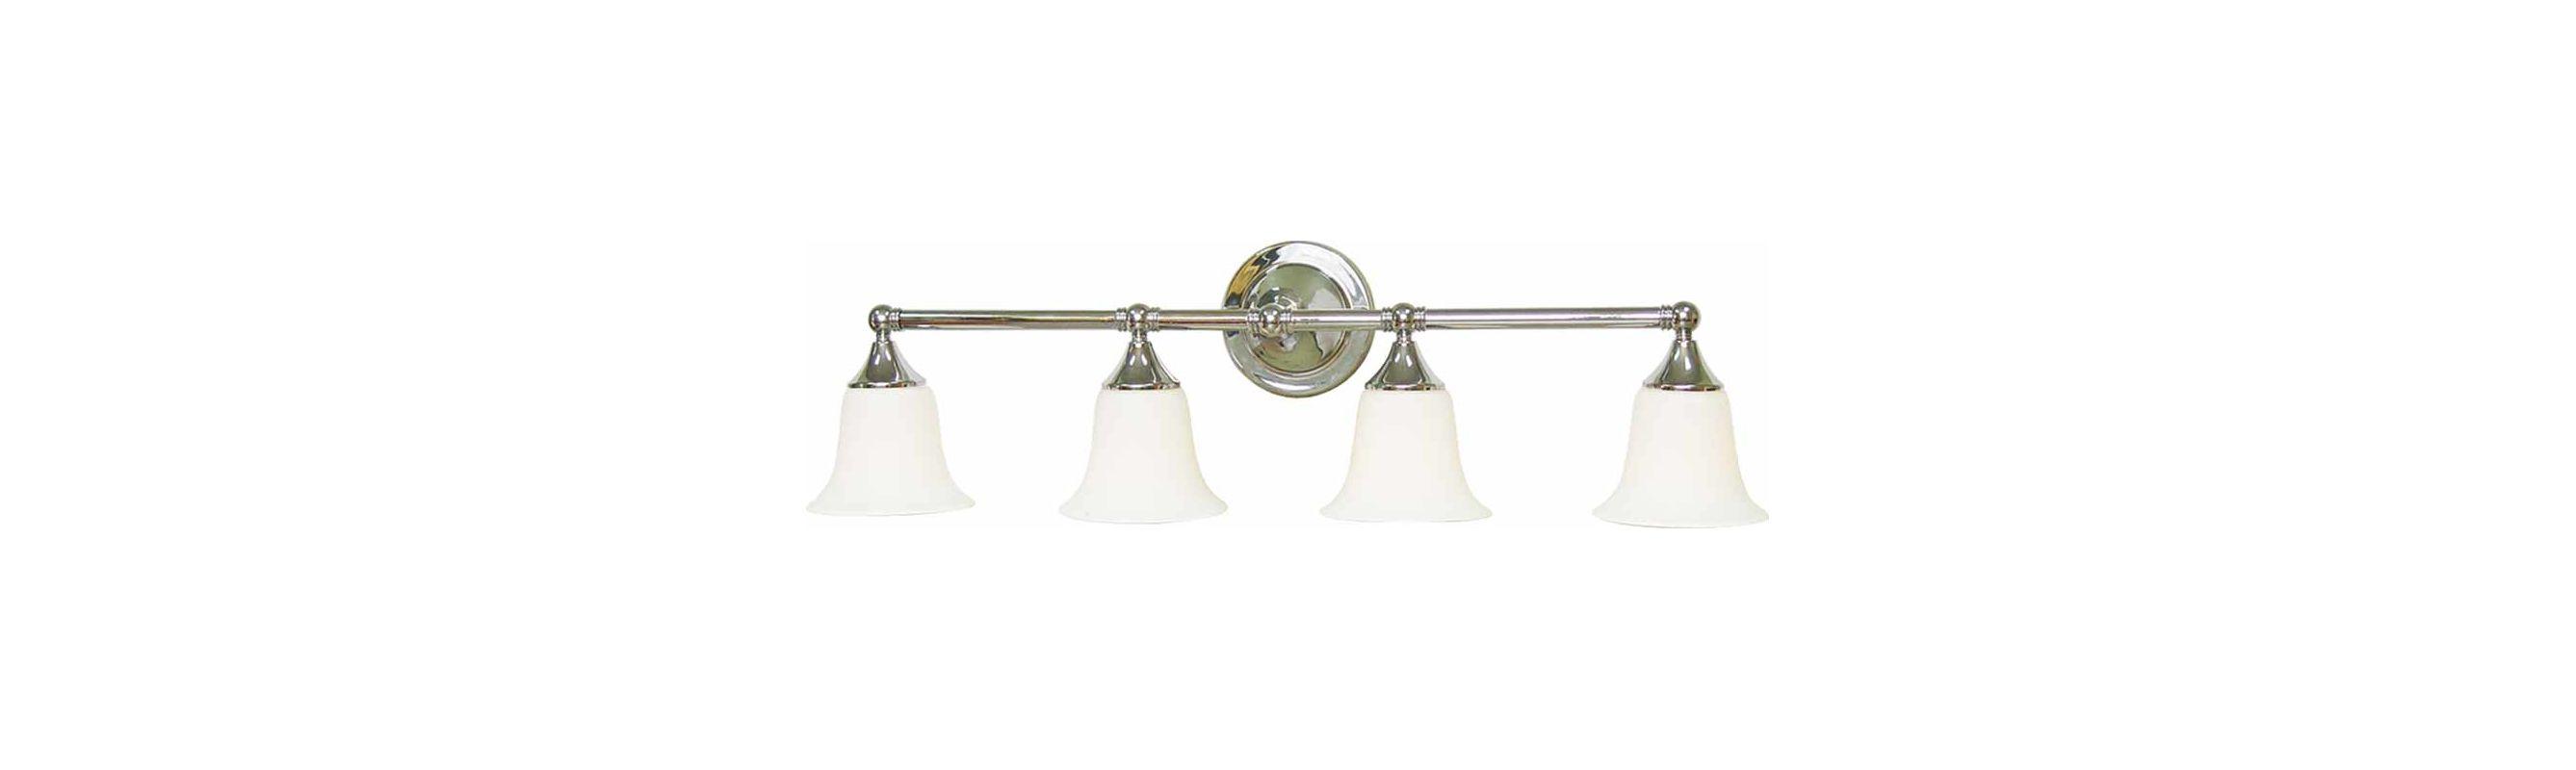 "Volume Lighting V1364 4 Light 34.5"" Width Bathroom Vanity Light with"